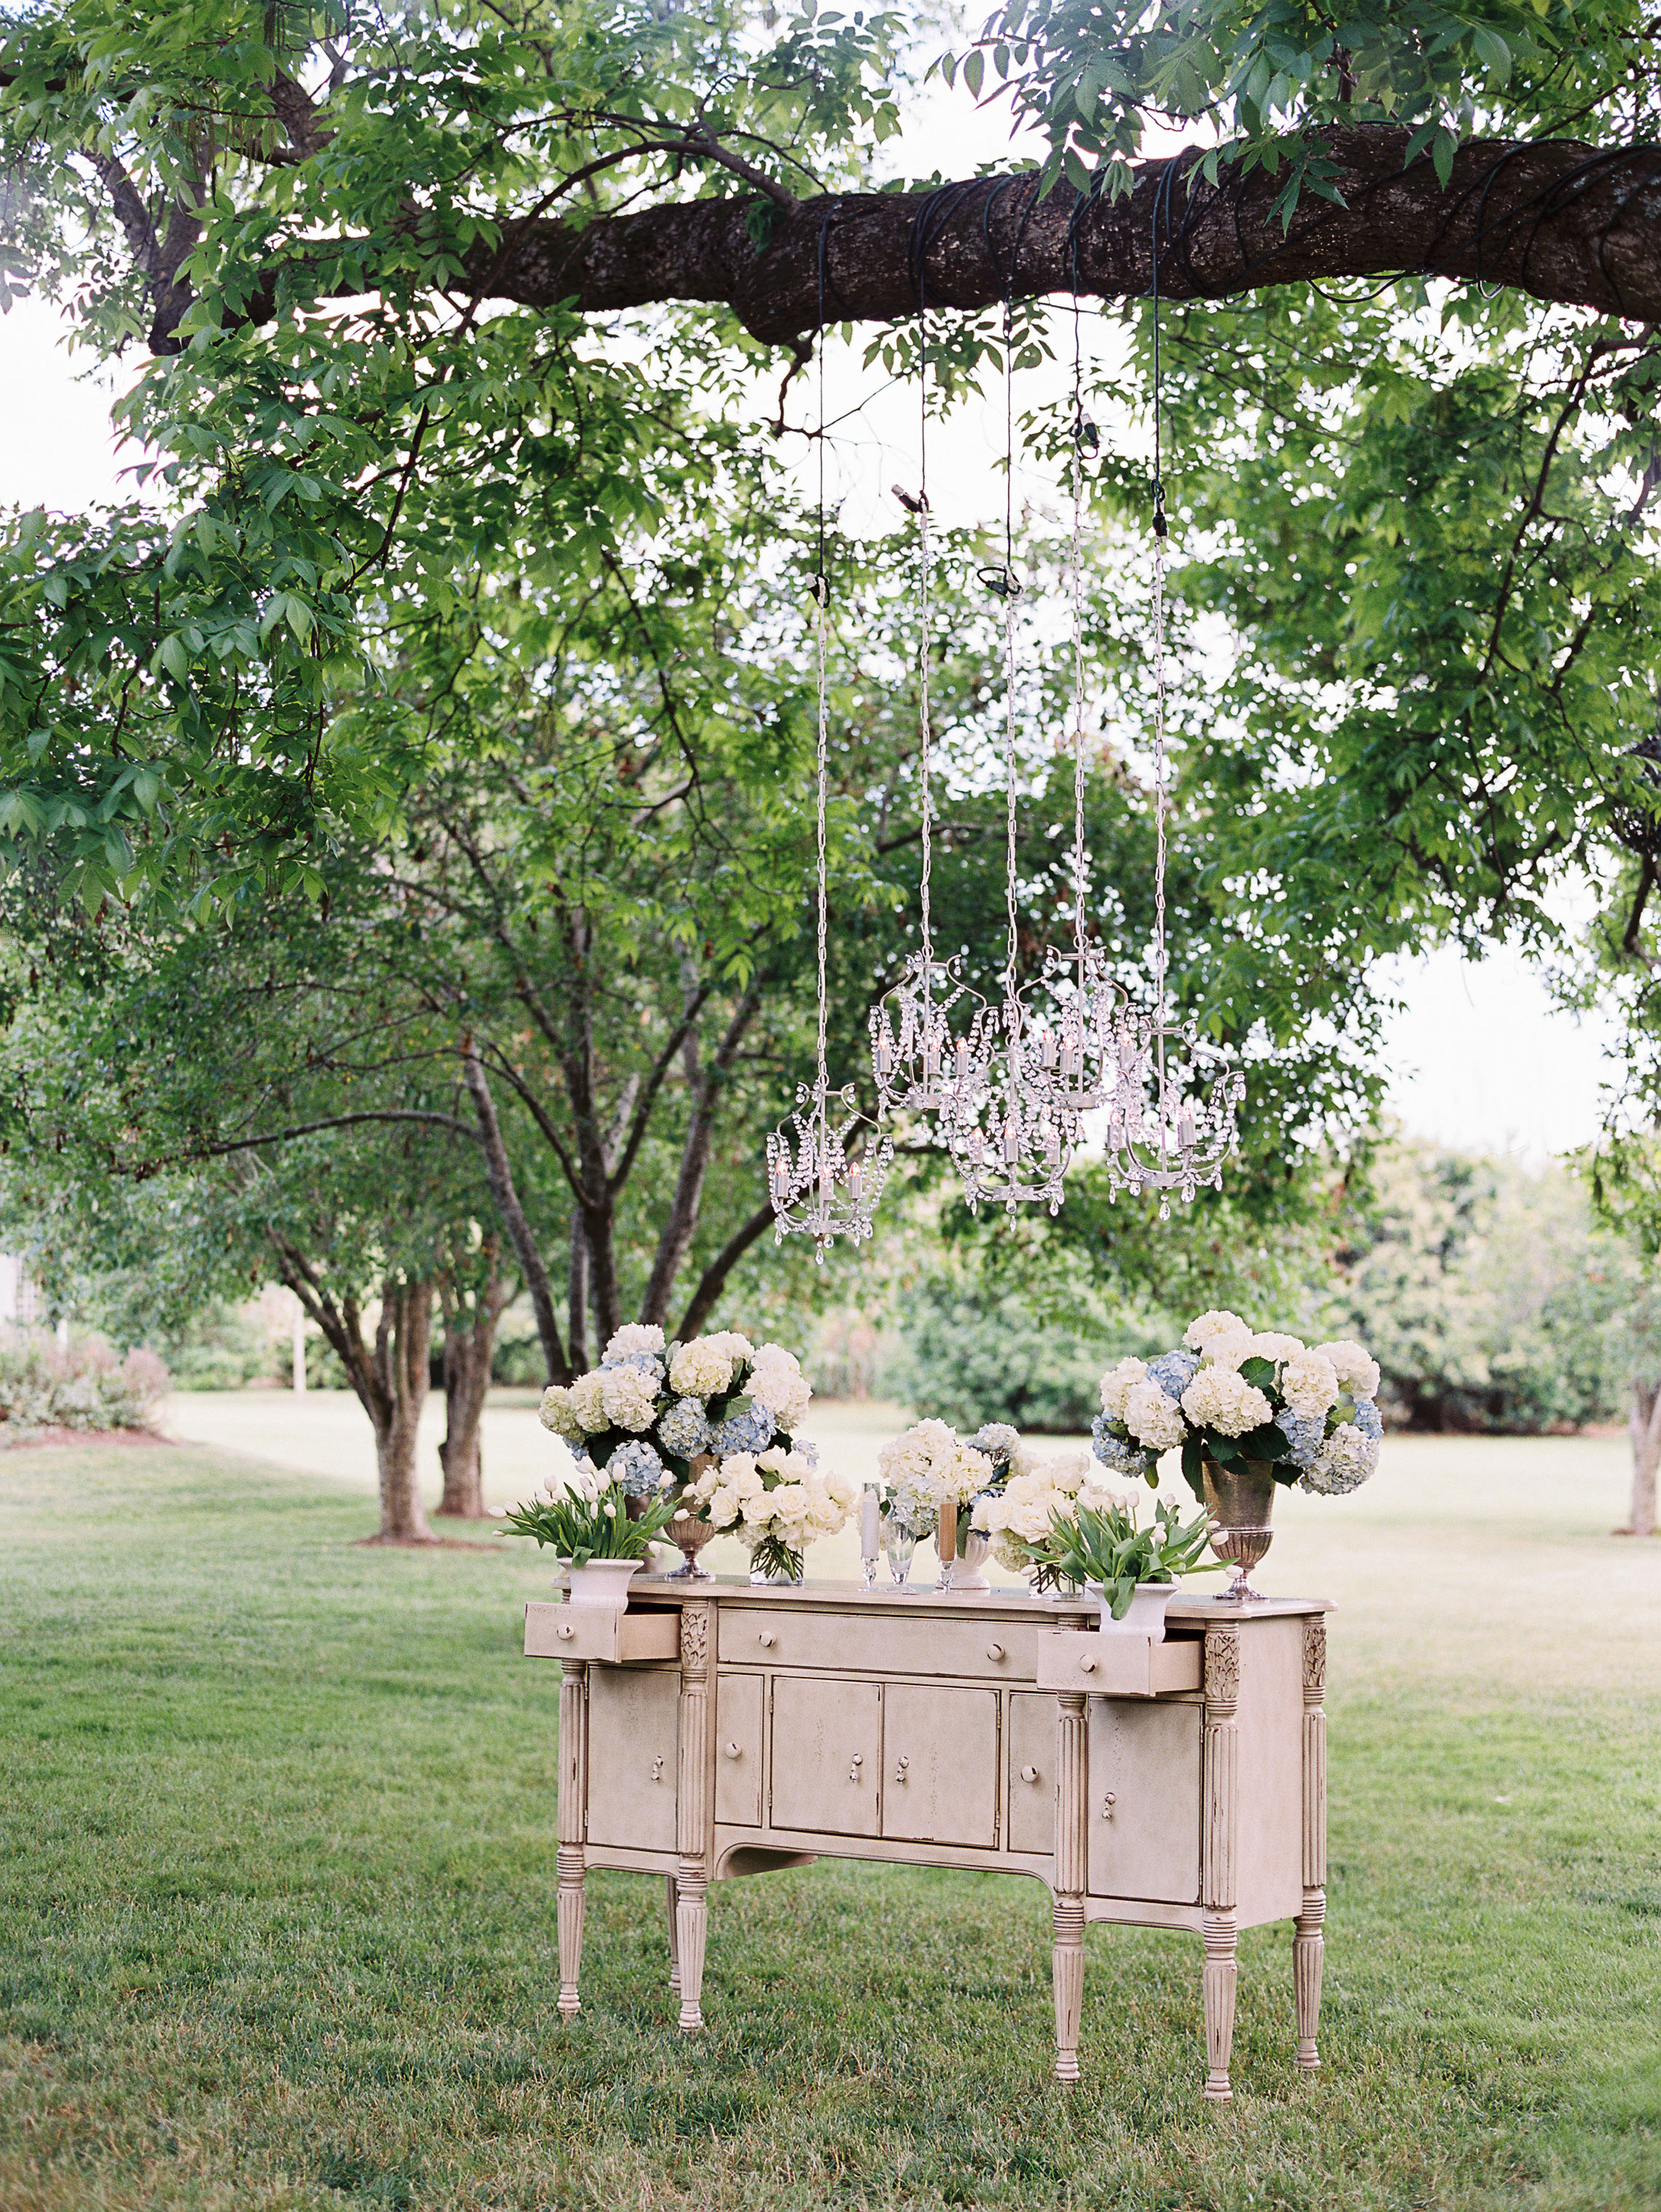 wedding chandelier outdoor suspended above antique furniture